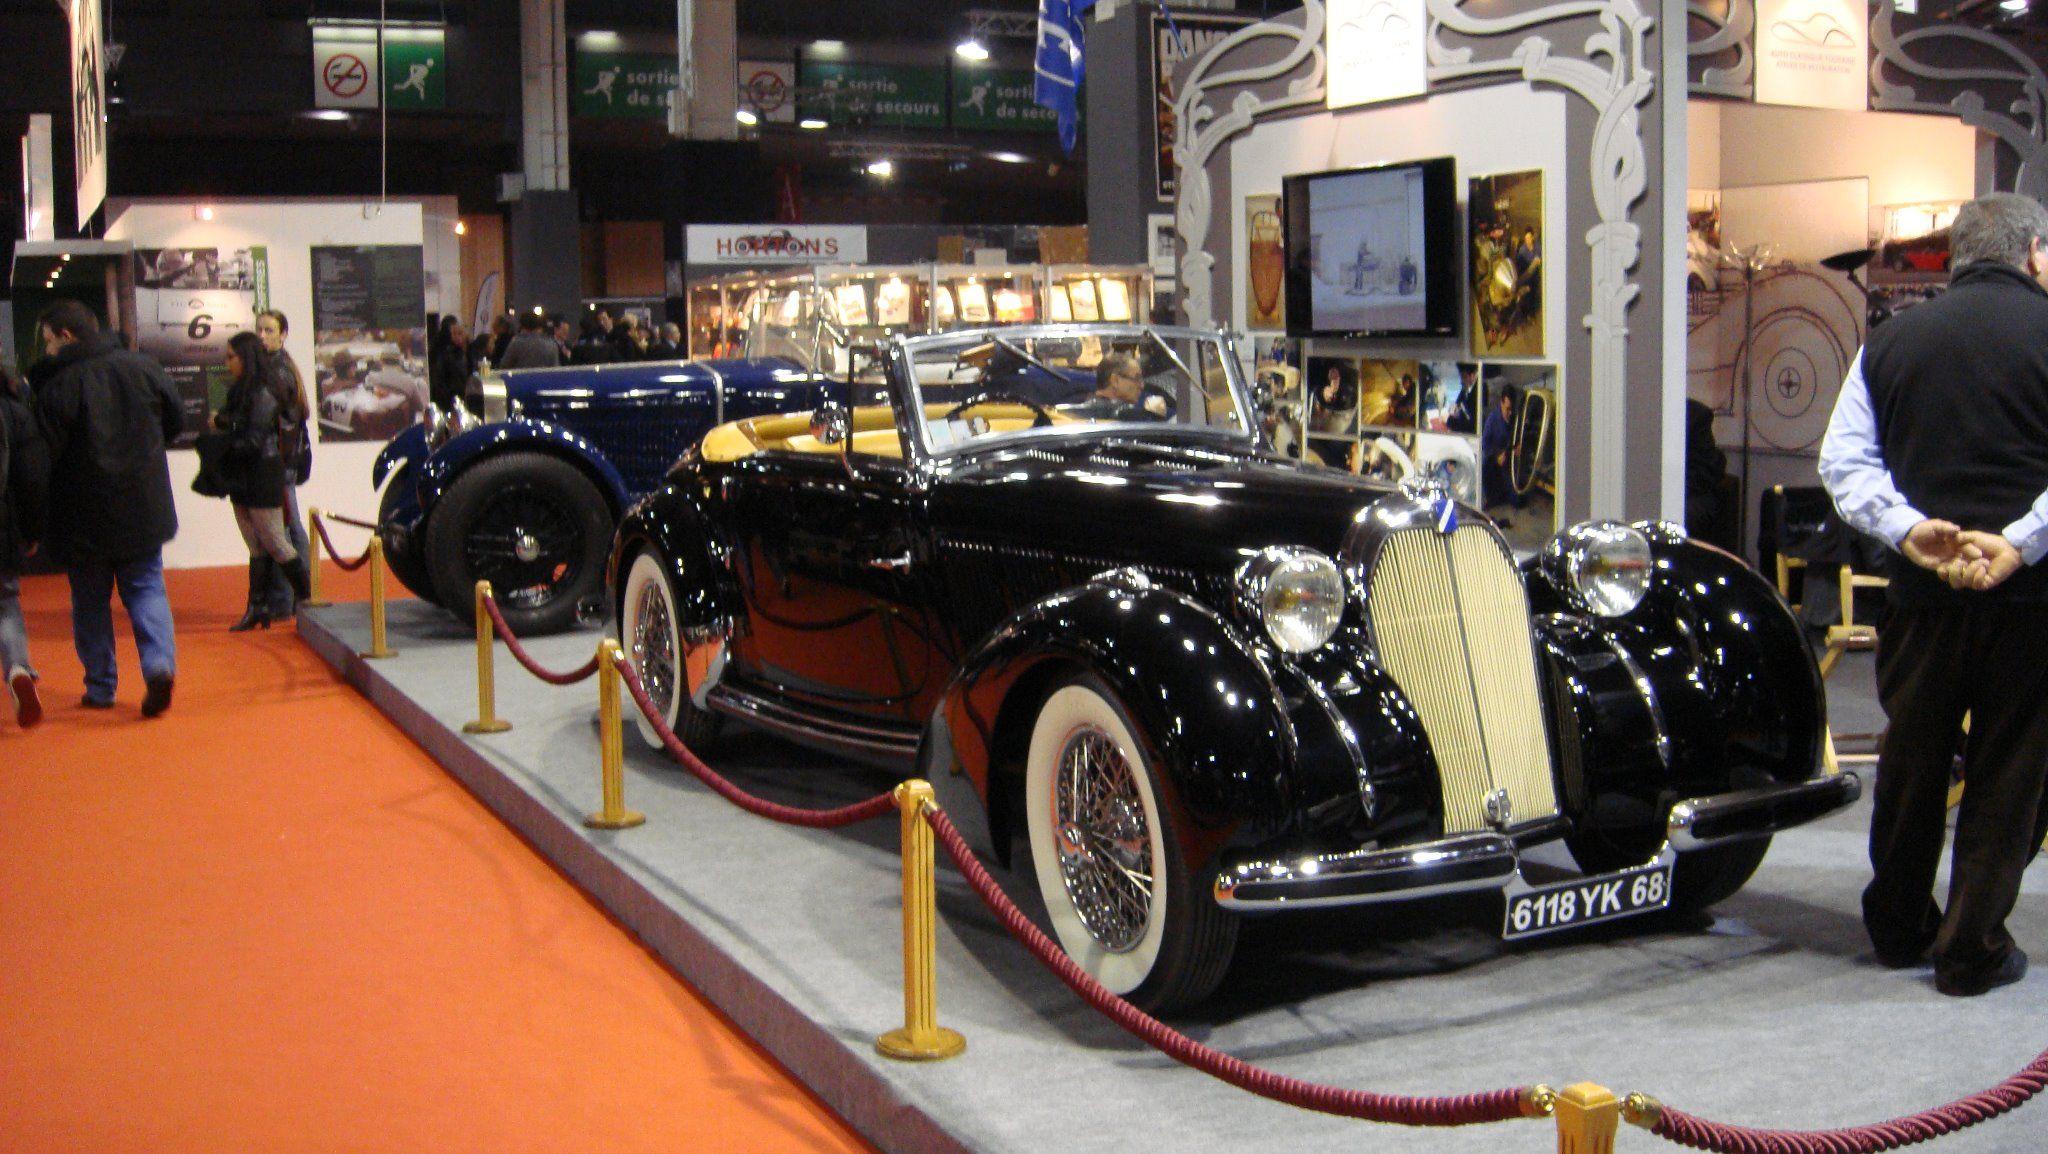 #Vintage #car